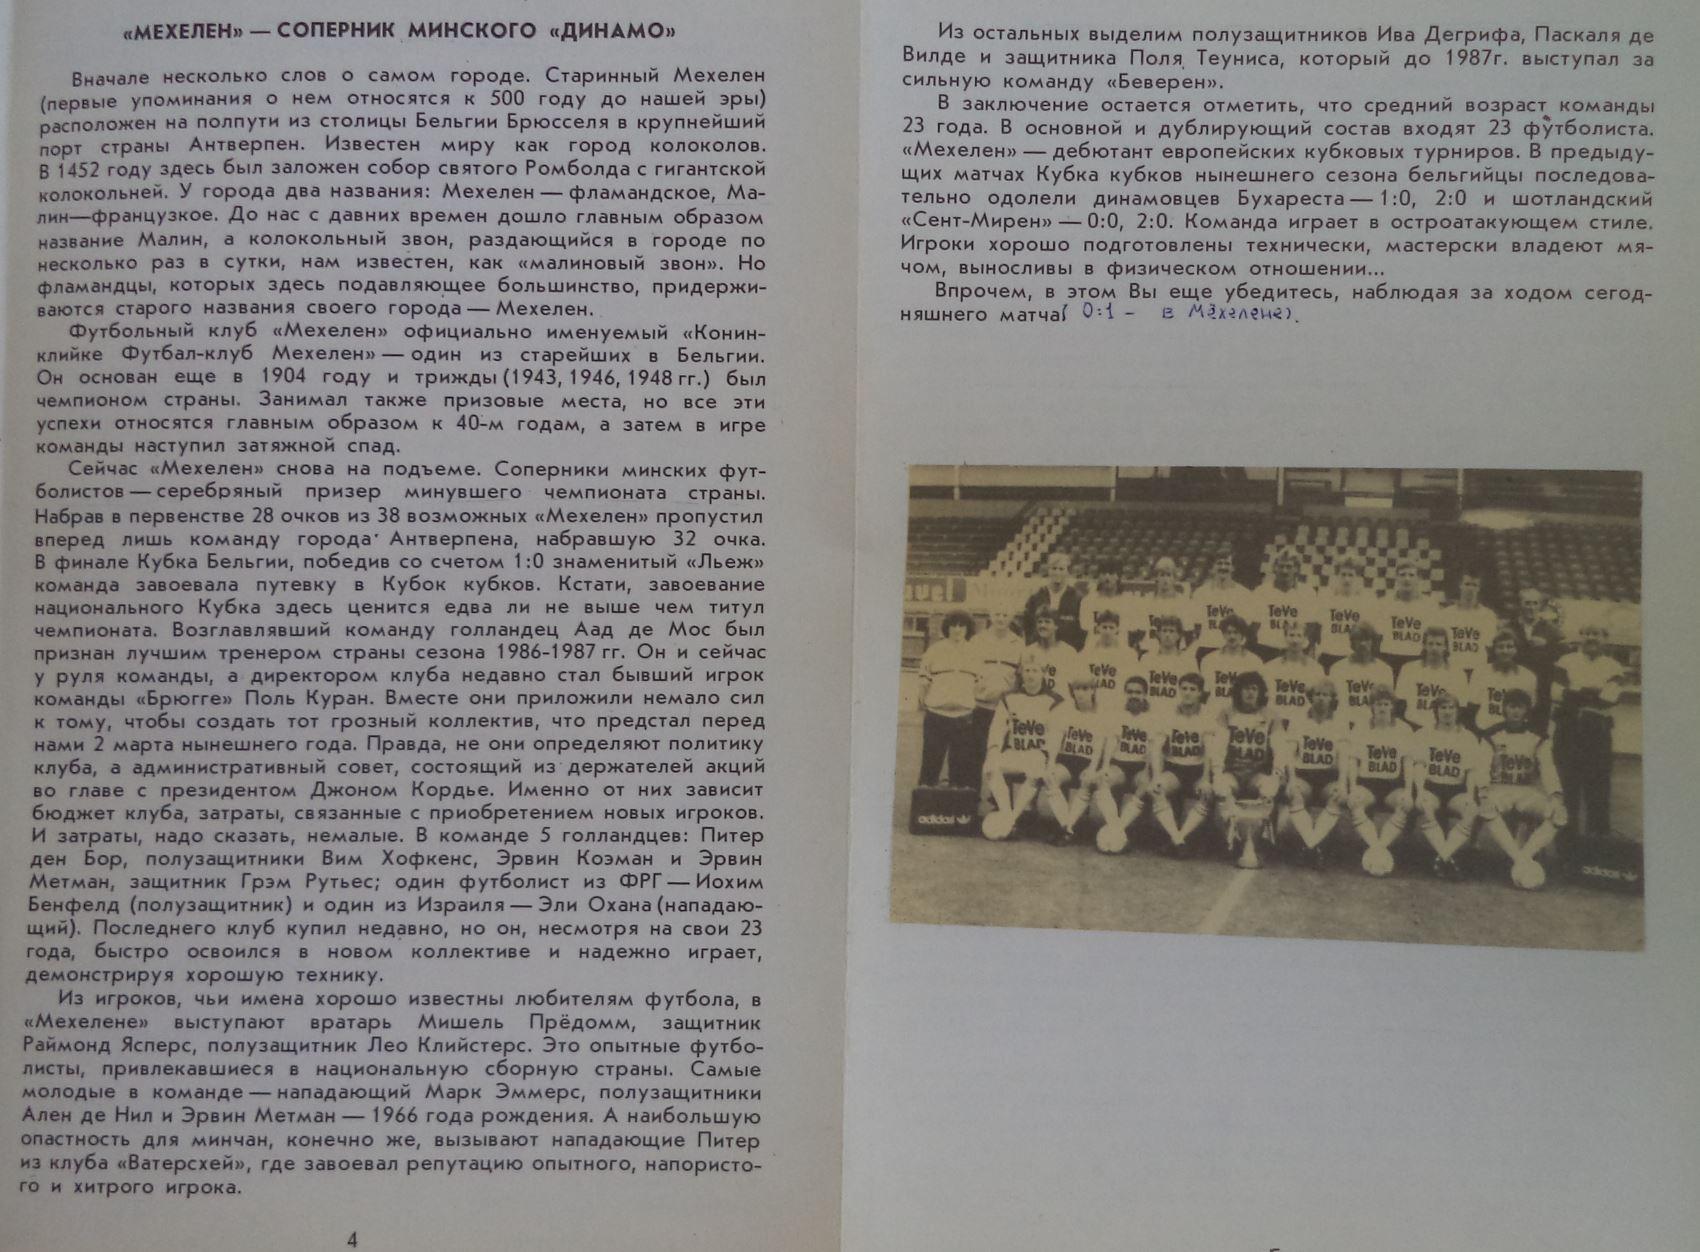 Динамо Мн (СССР) - Мехелен (Бельгия) 1:1